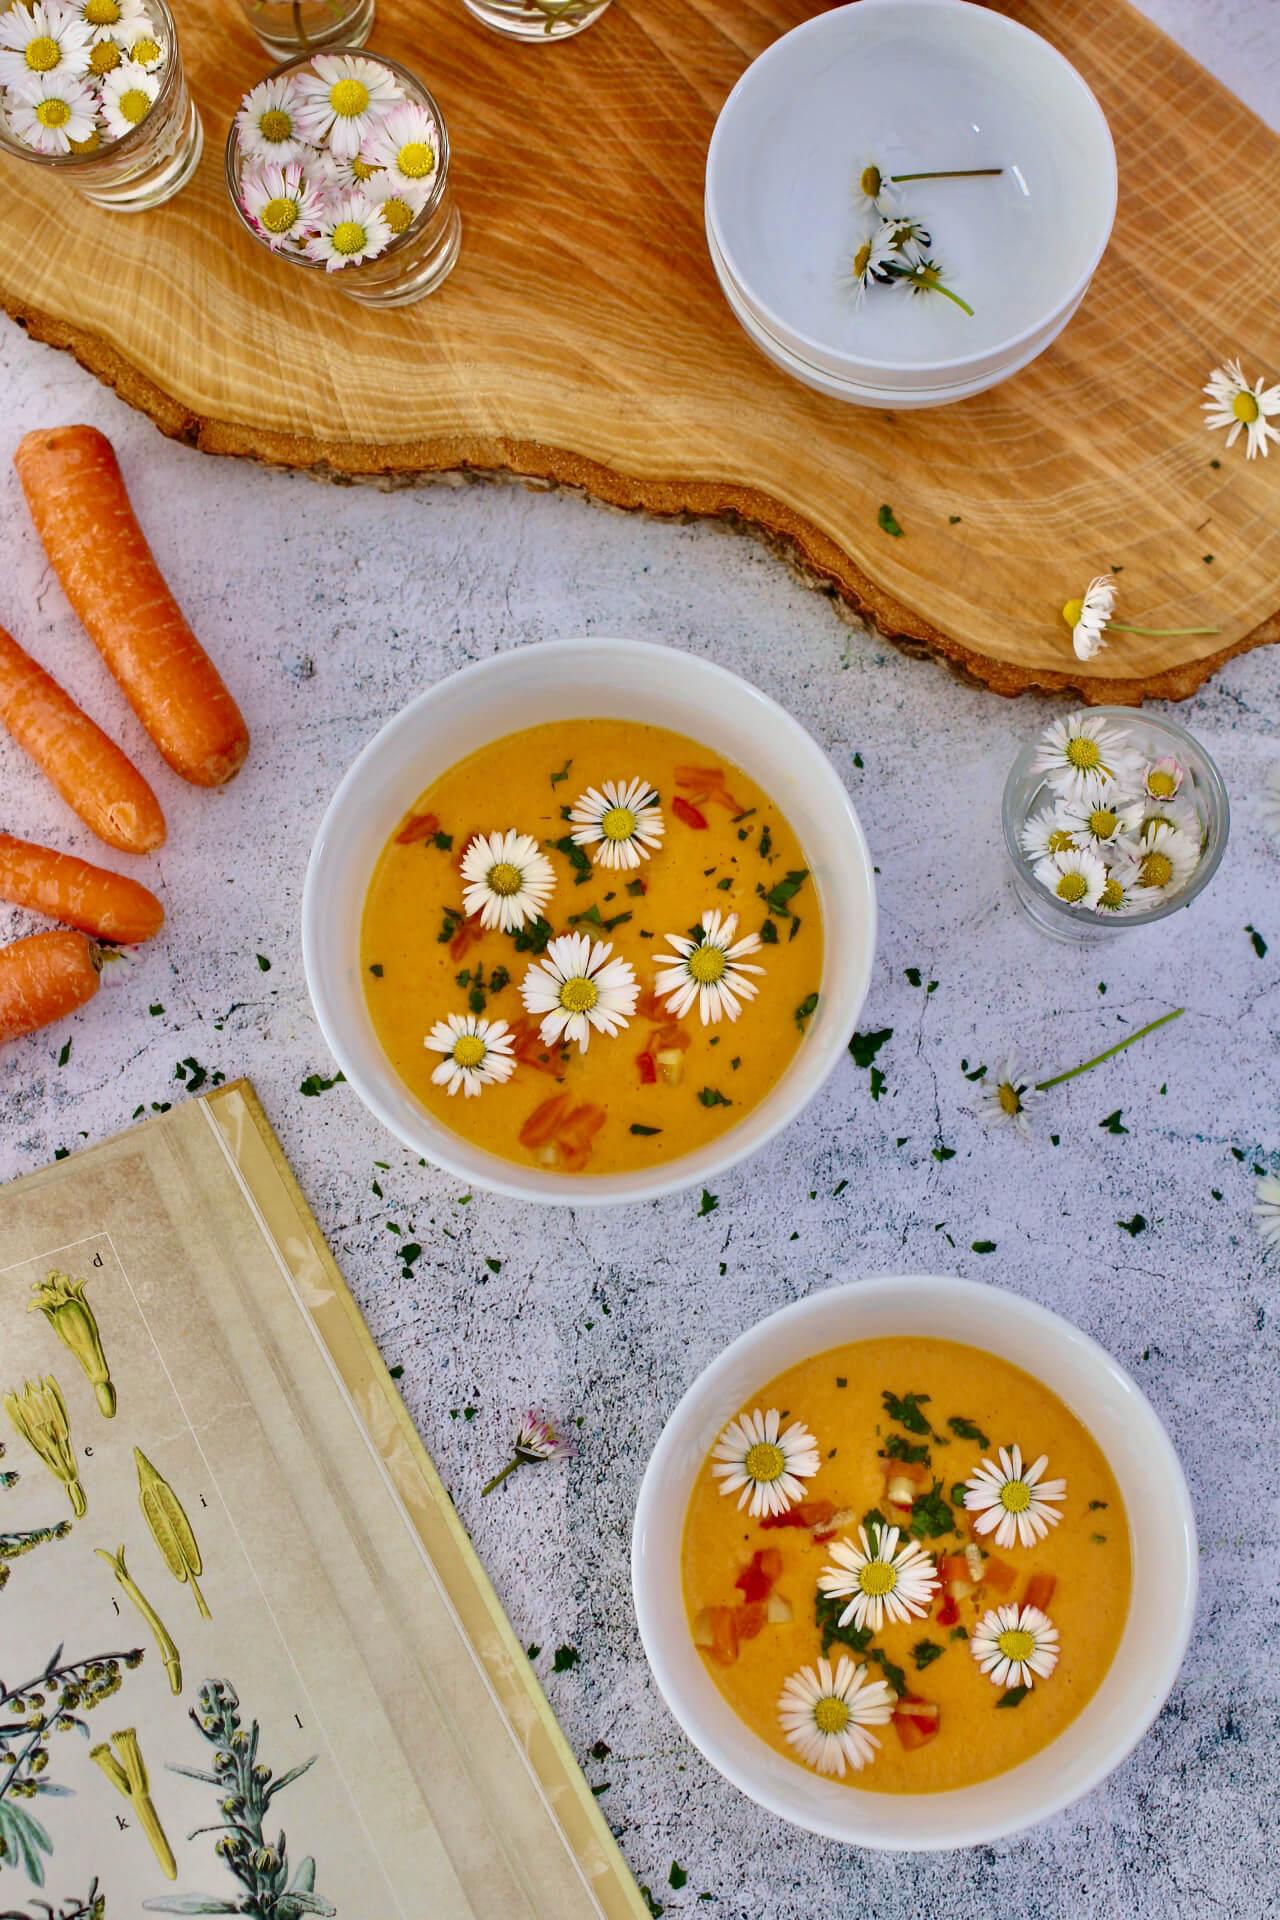 Karottensuppe mit Gänseblümchen